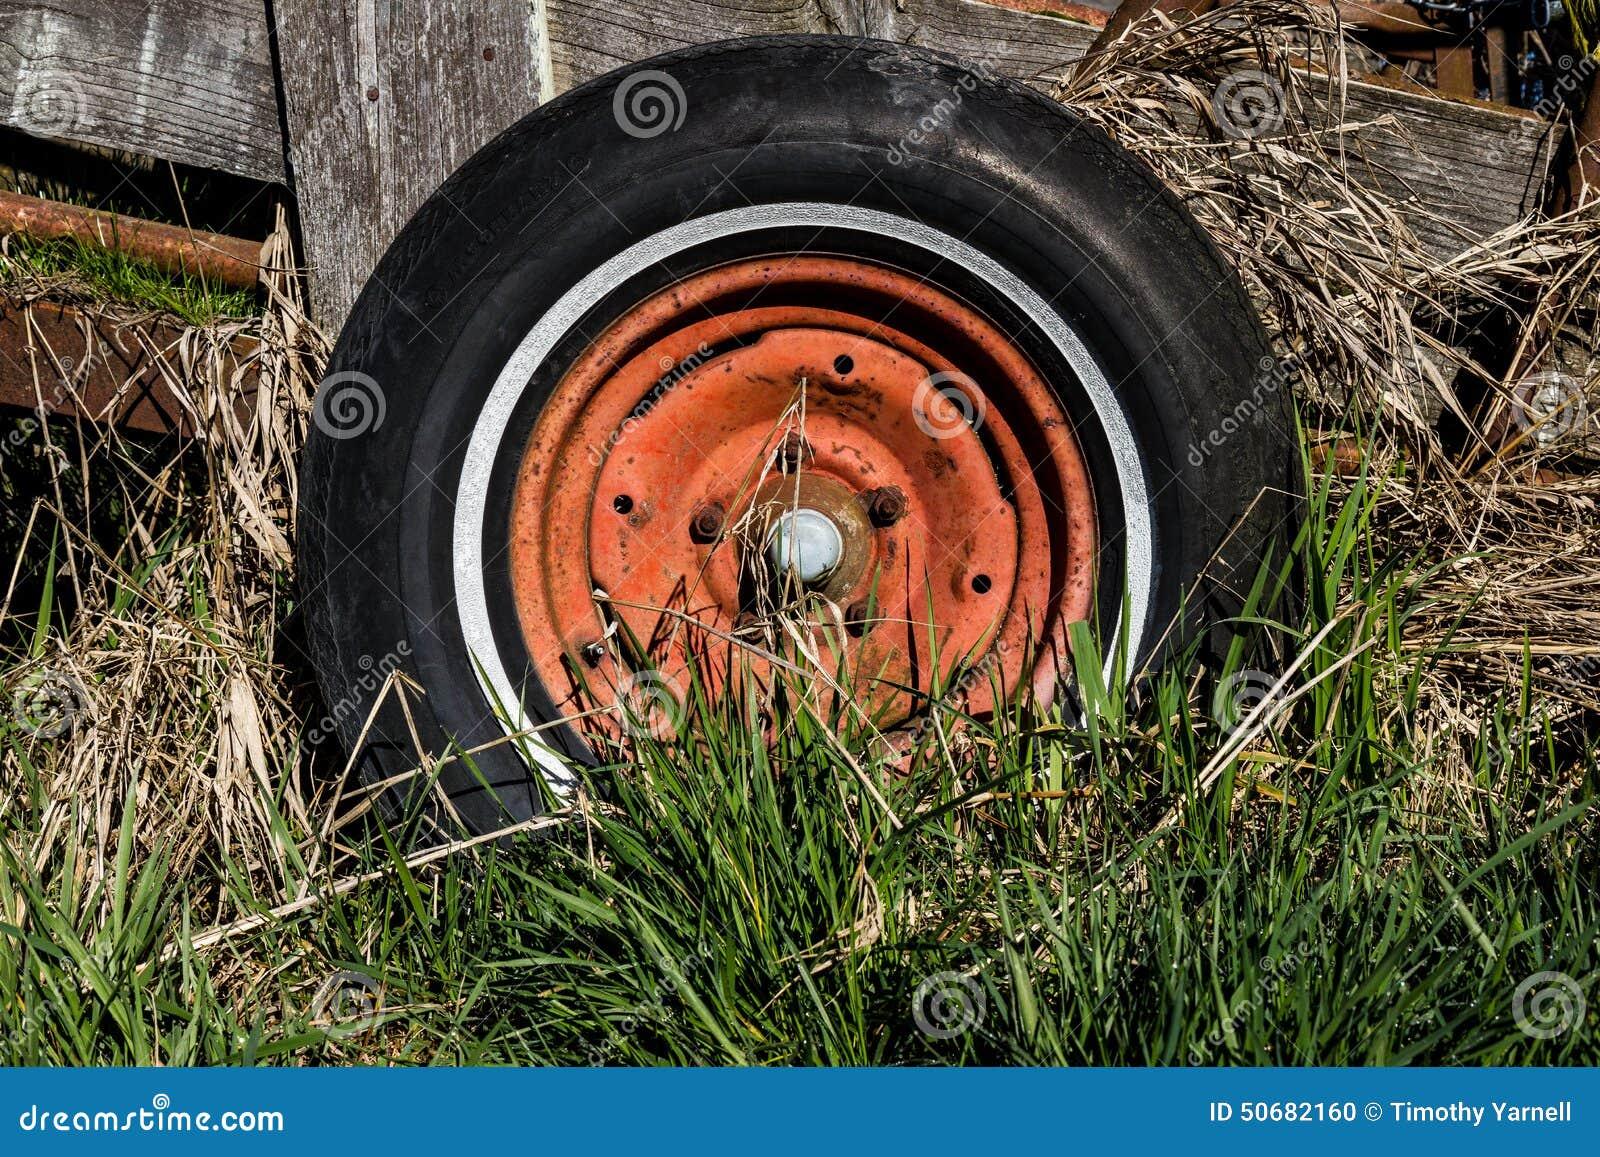 Download 马车车轮 库存照片. 图片 包括有 投反对票, 放弃了, 杂草, 绿色, 轮子, 设备, 木头, 轮胎, 无盖货车 - 50682160